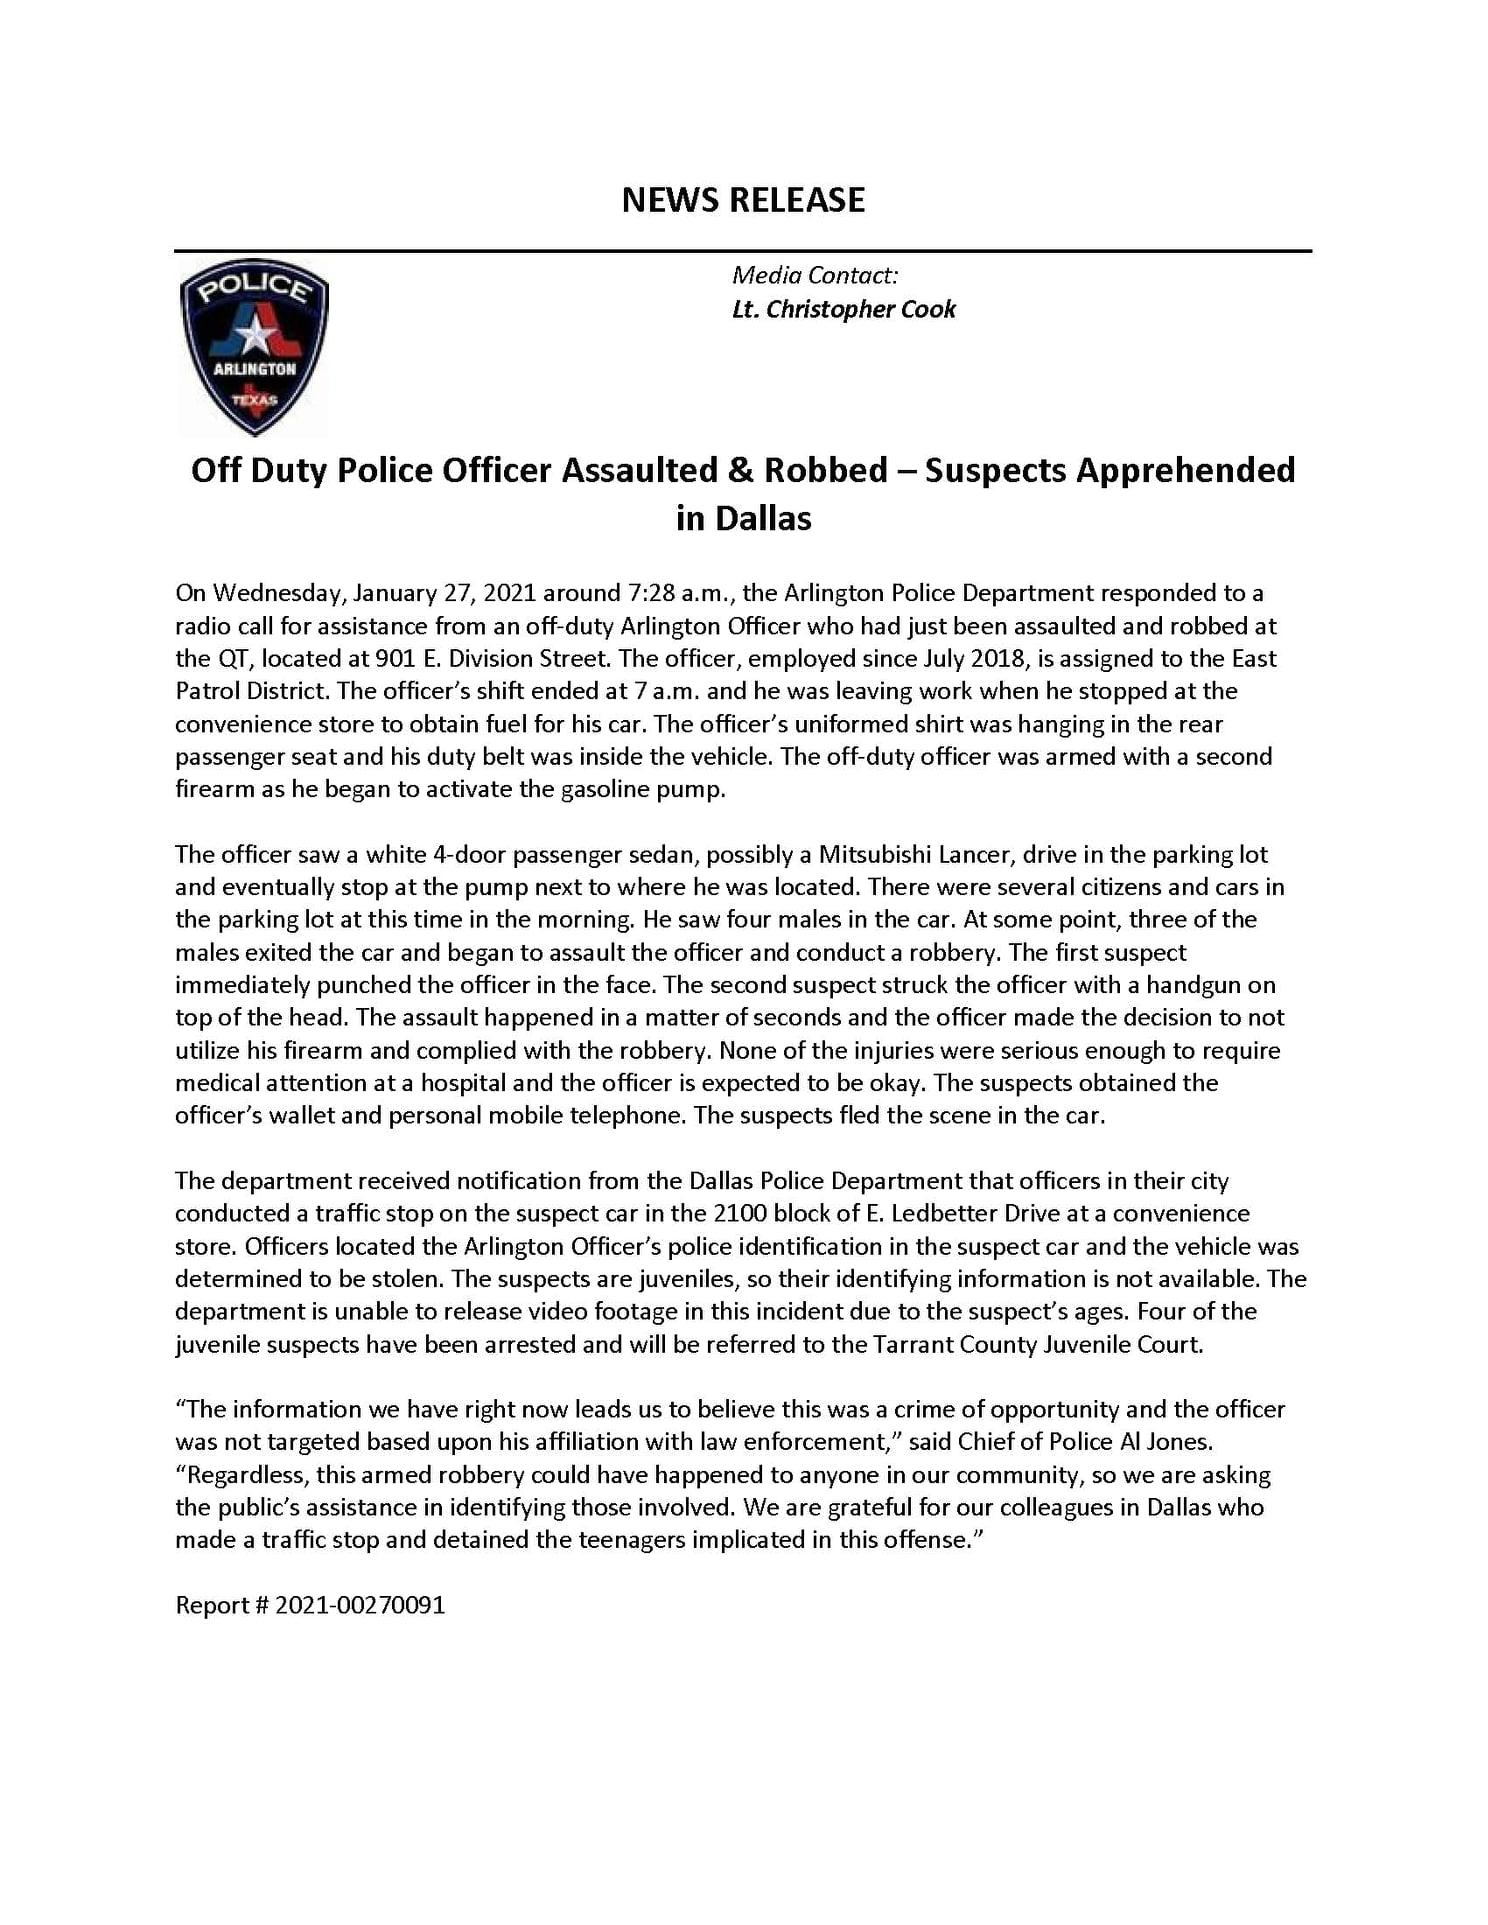 Arlington press release